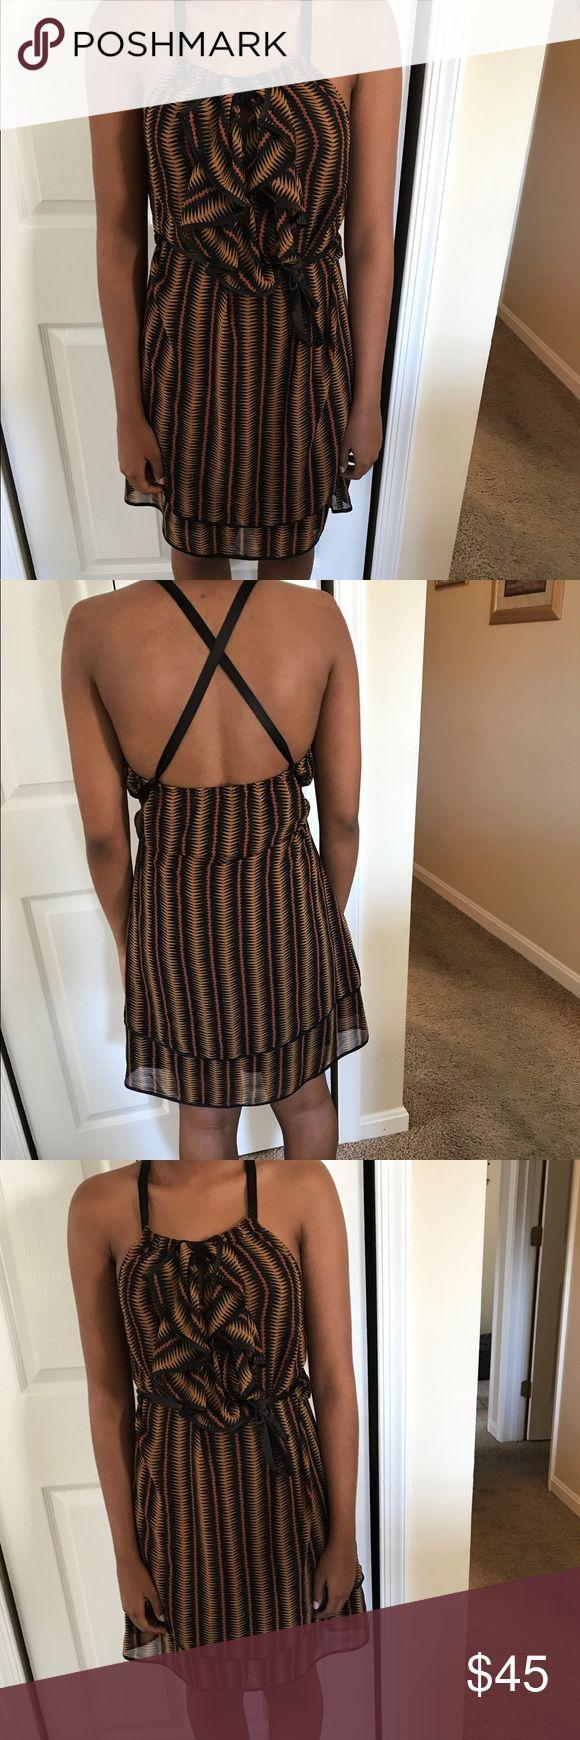 HOST PICK 1/3/18 ! 💕 BCBGeneration dress ! Great condition ! Host pick at the Style Crush Party🎉💕💕💕🎉🎉🎉🎉 BCBGeneration Dresses Mini